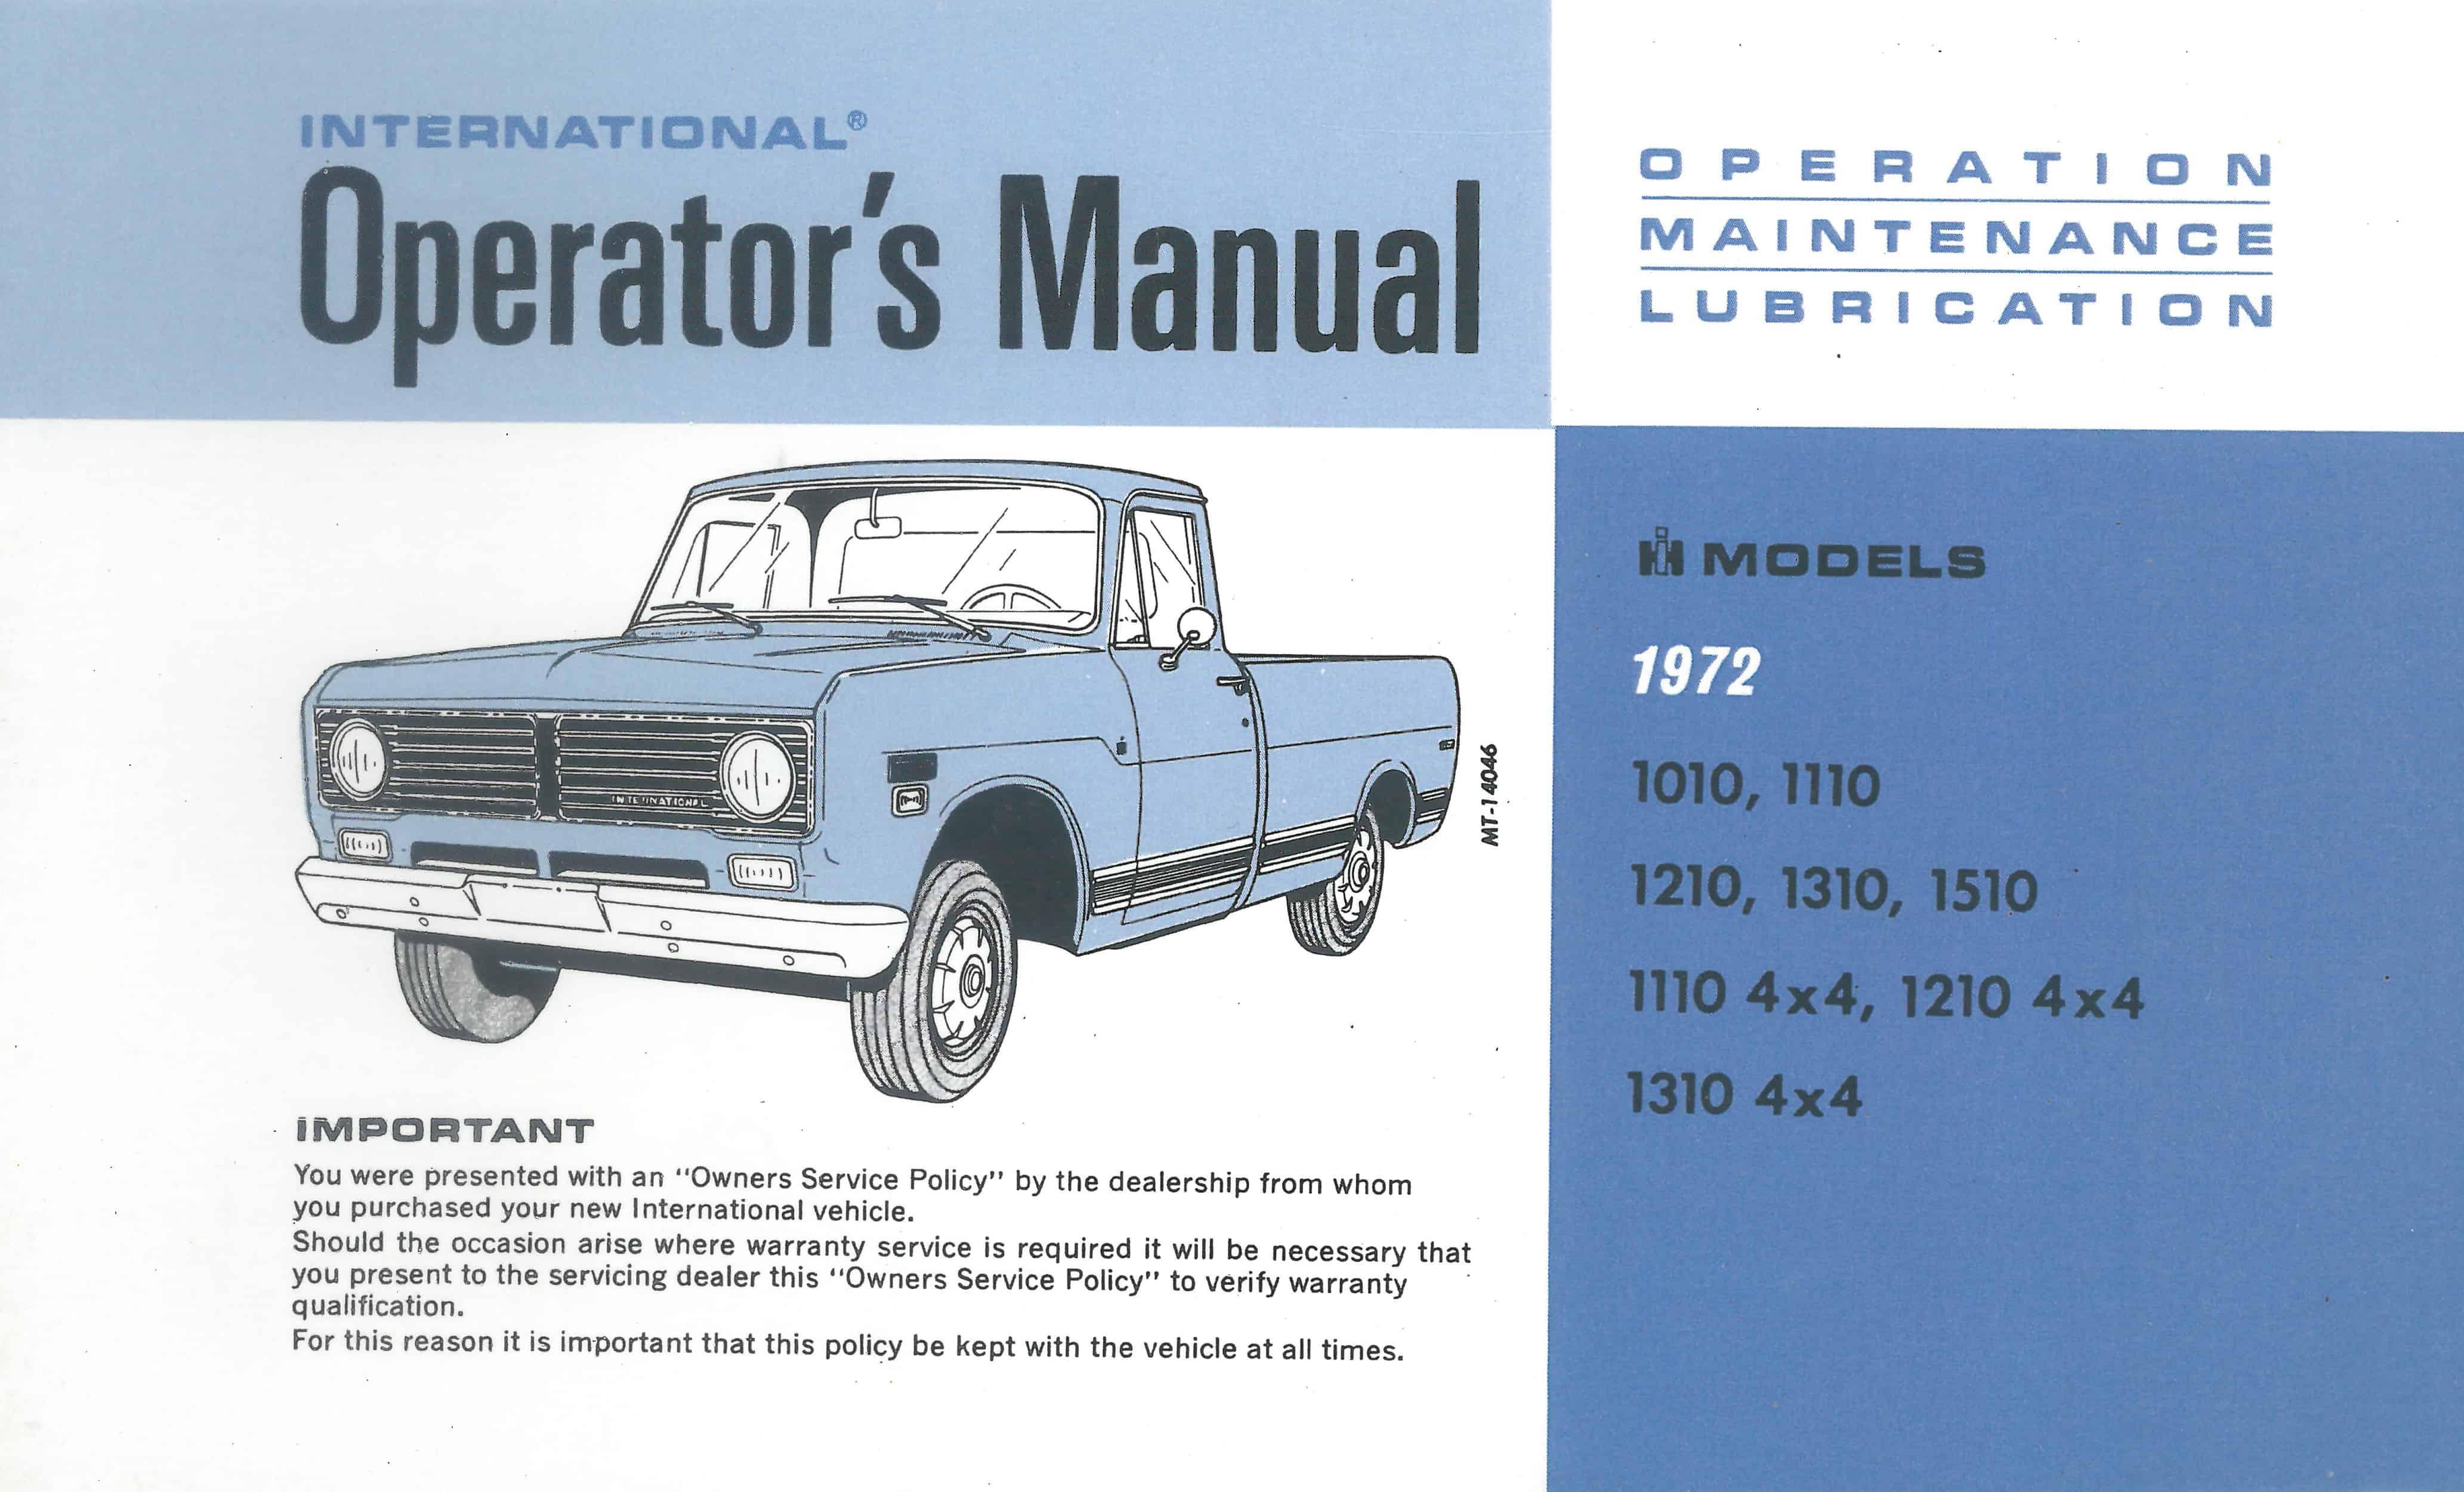 owners operating manual u2022 old international truck parts rh oldinternationaltrucks com international trucks service manual international trucks service manual